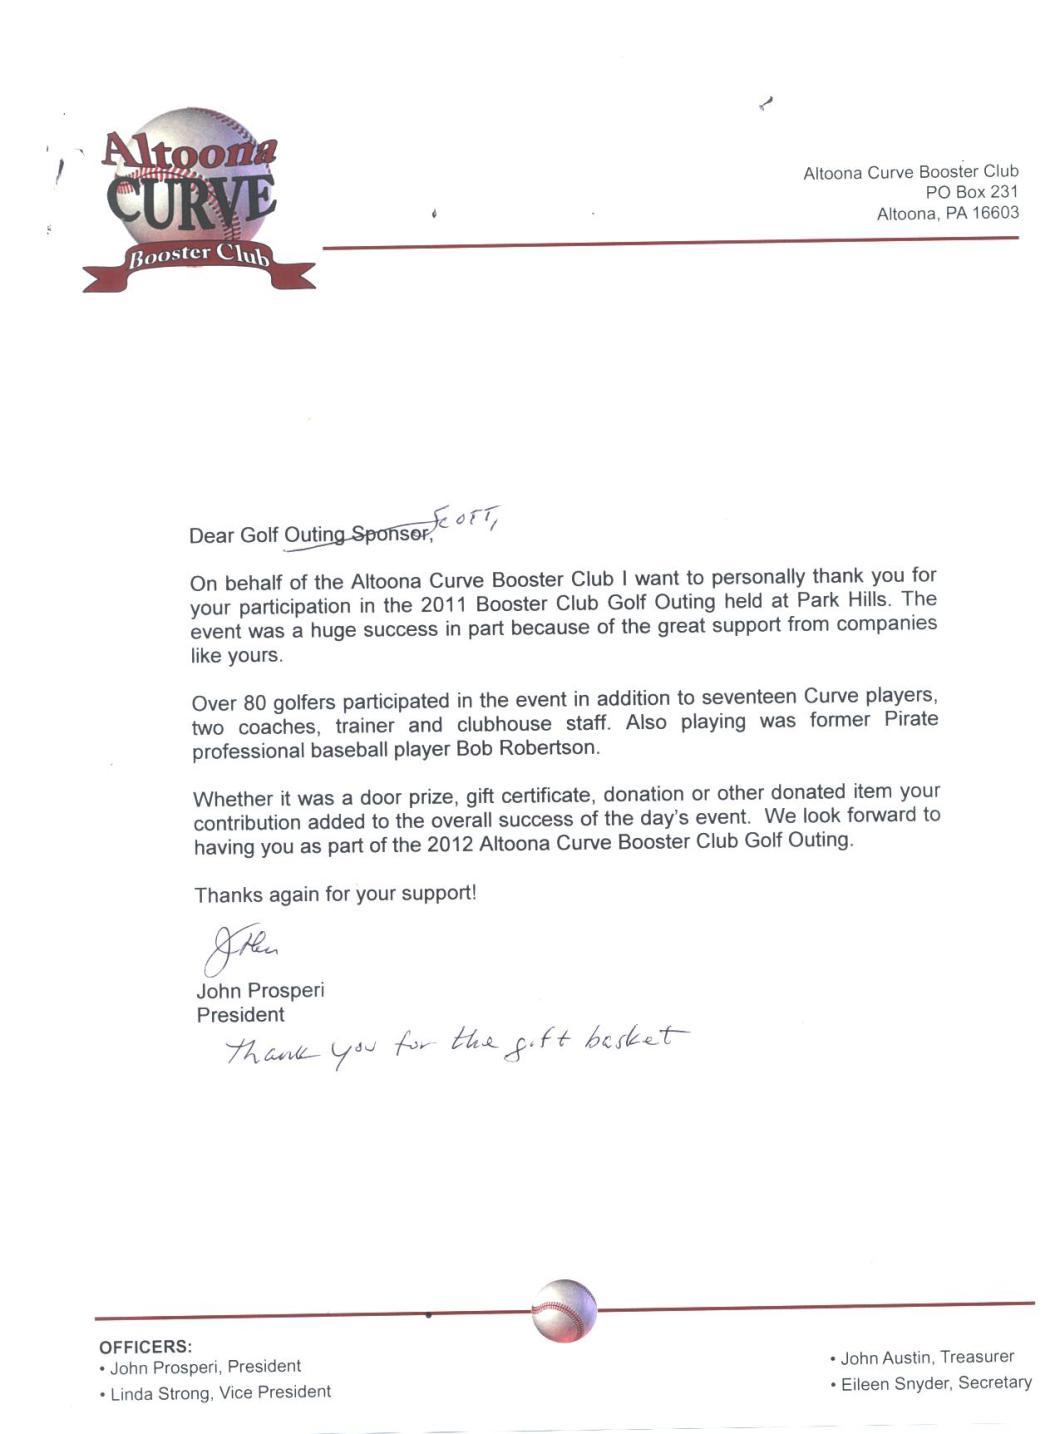 Sample Thank You Letter For Team Sponsorship Drive